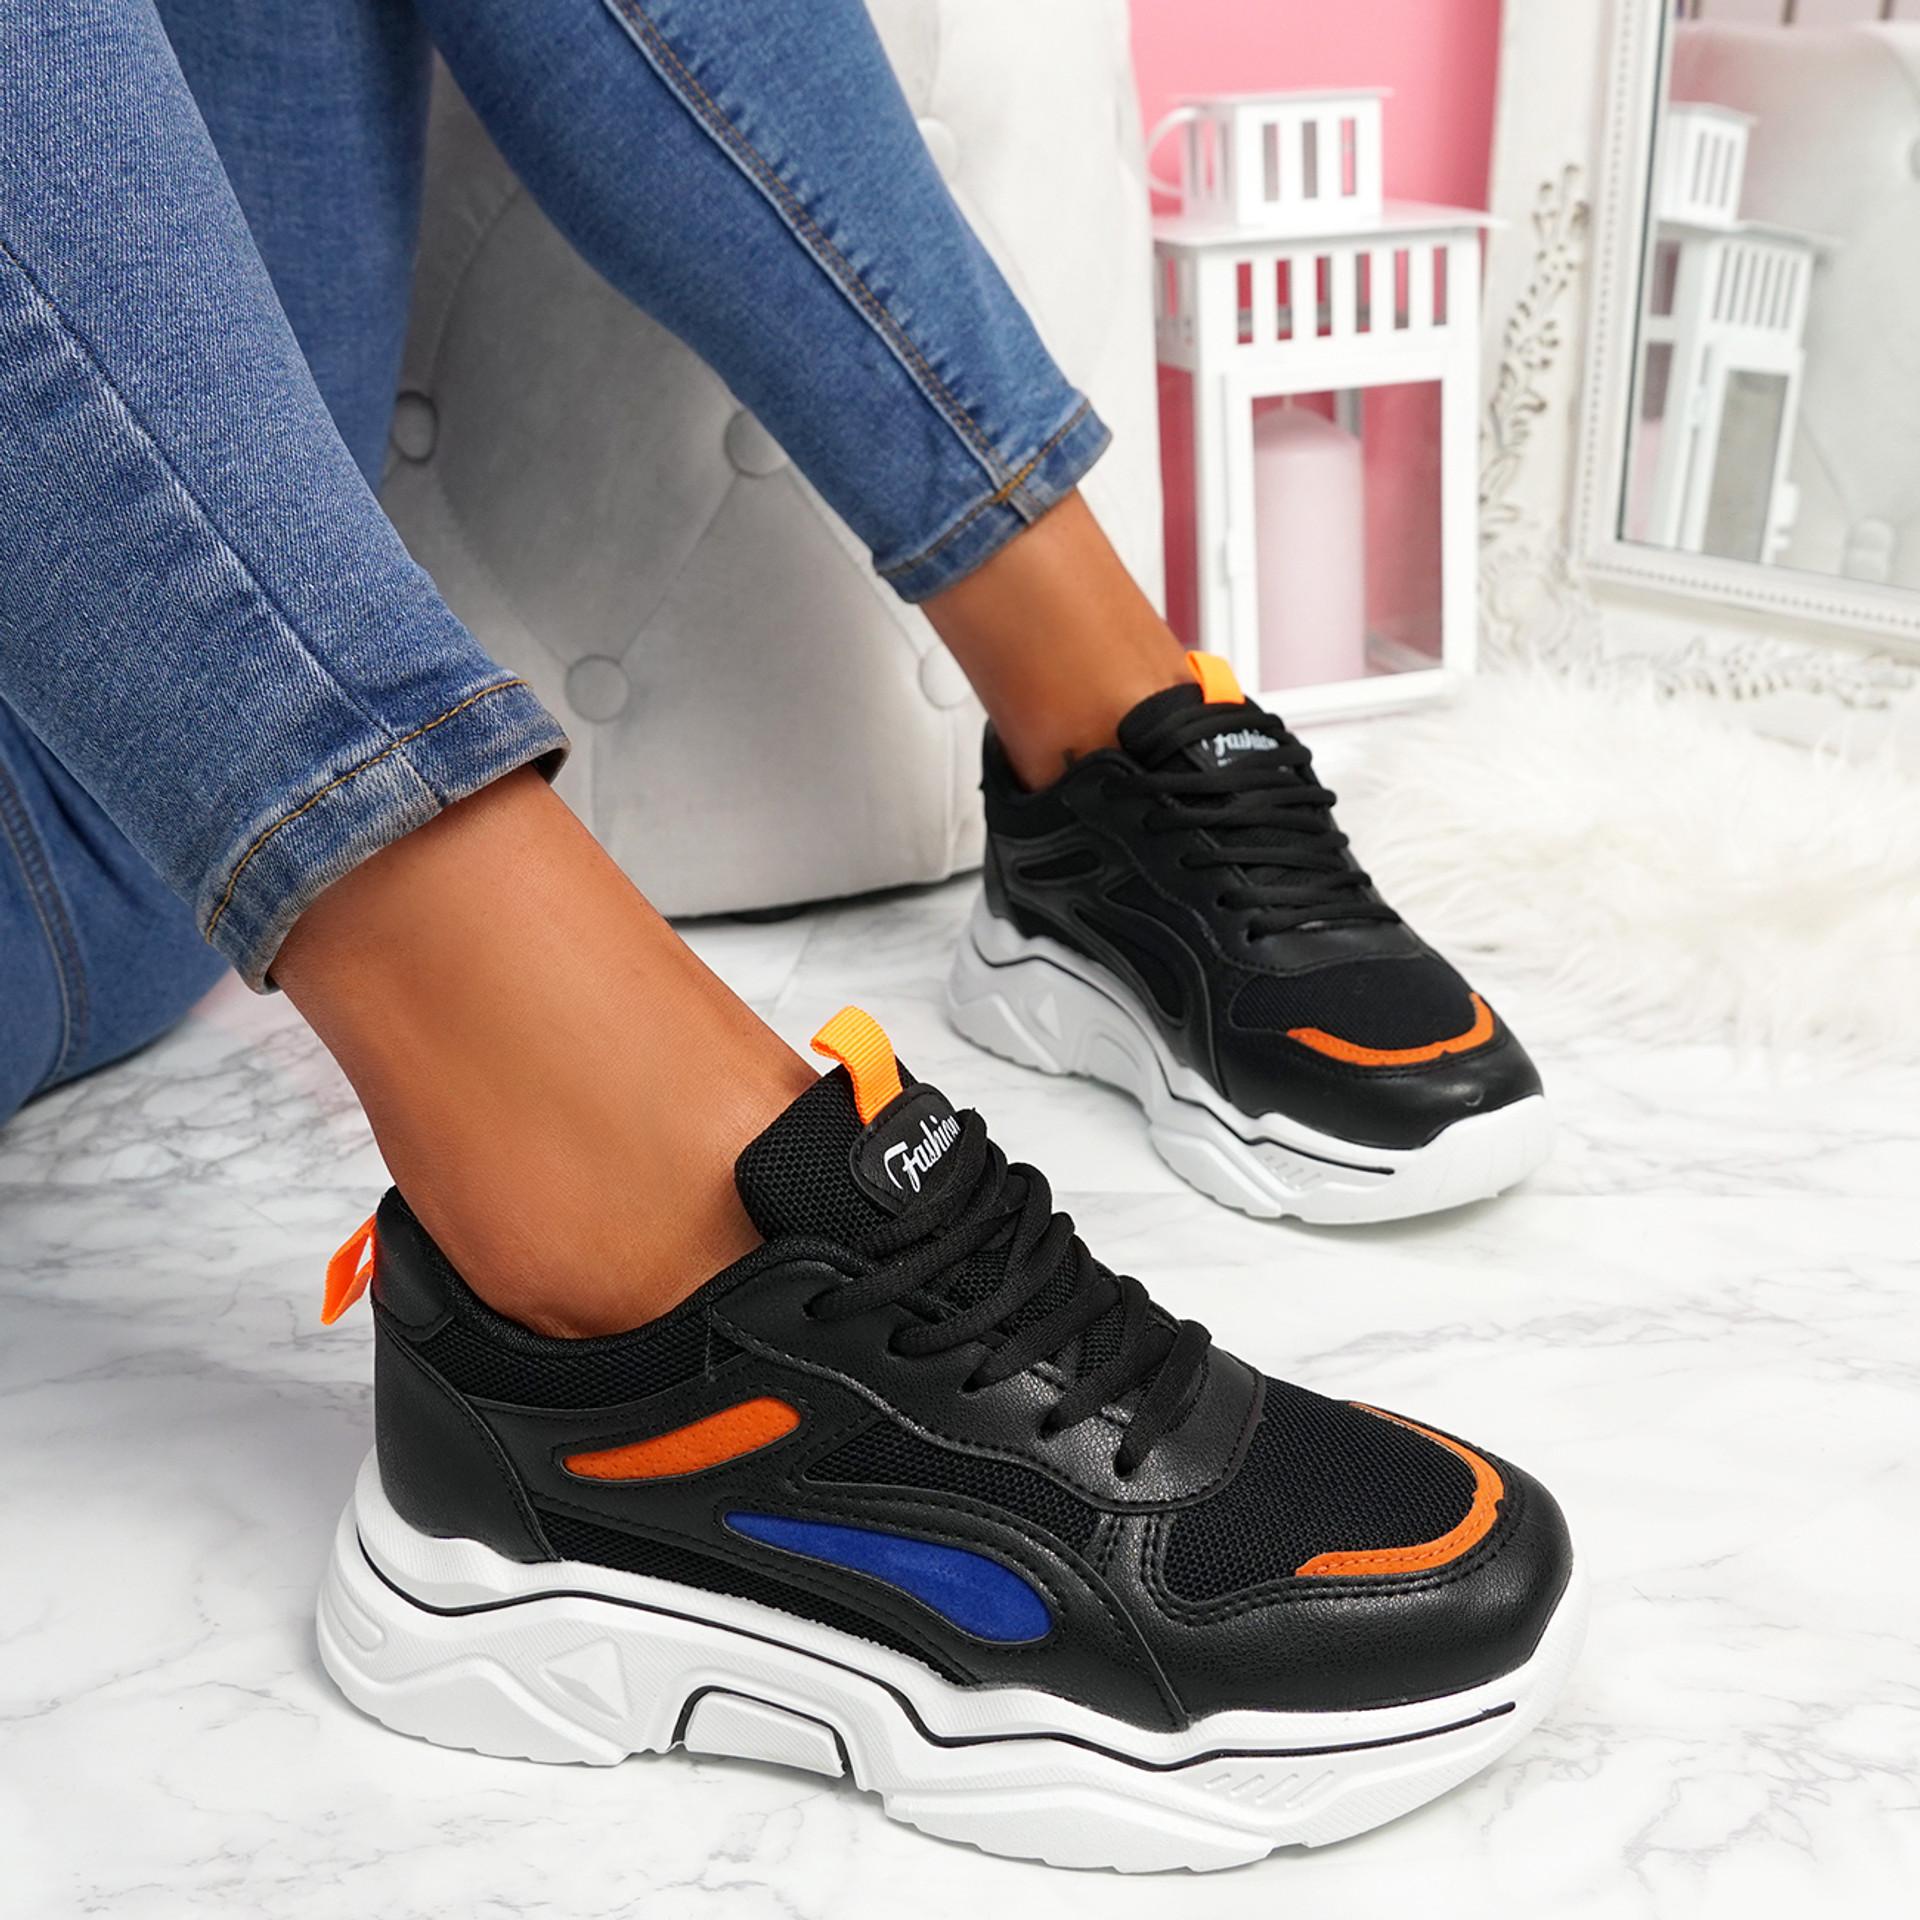 Nimme Black Chunky Sneakers